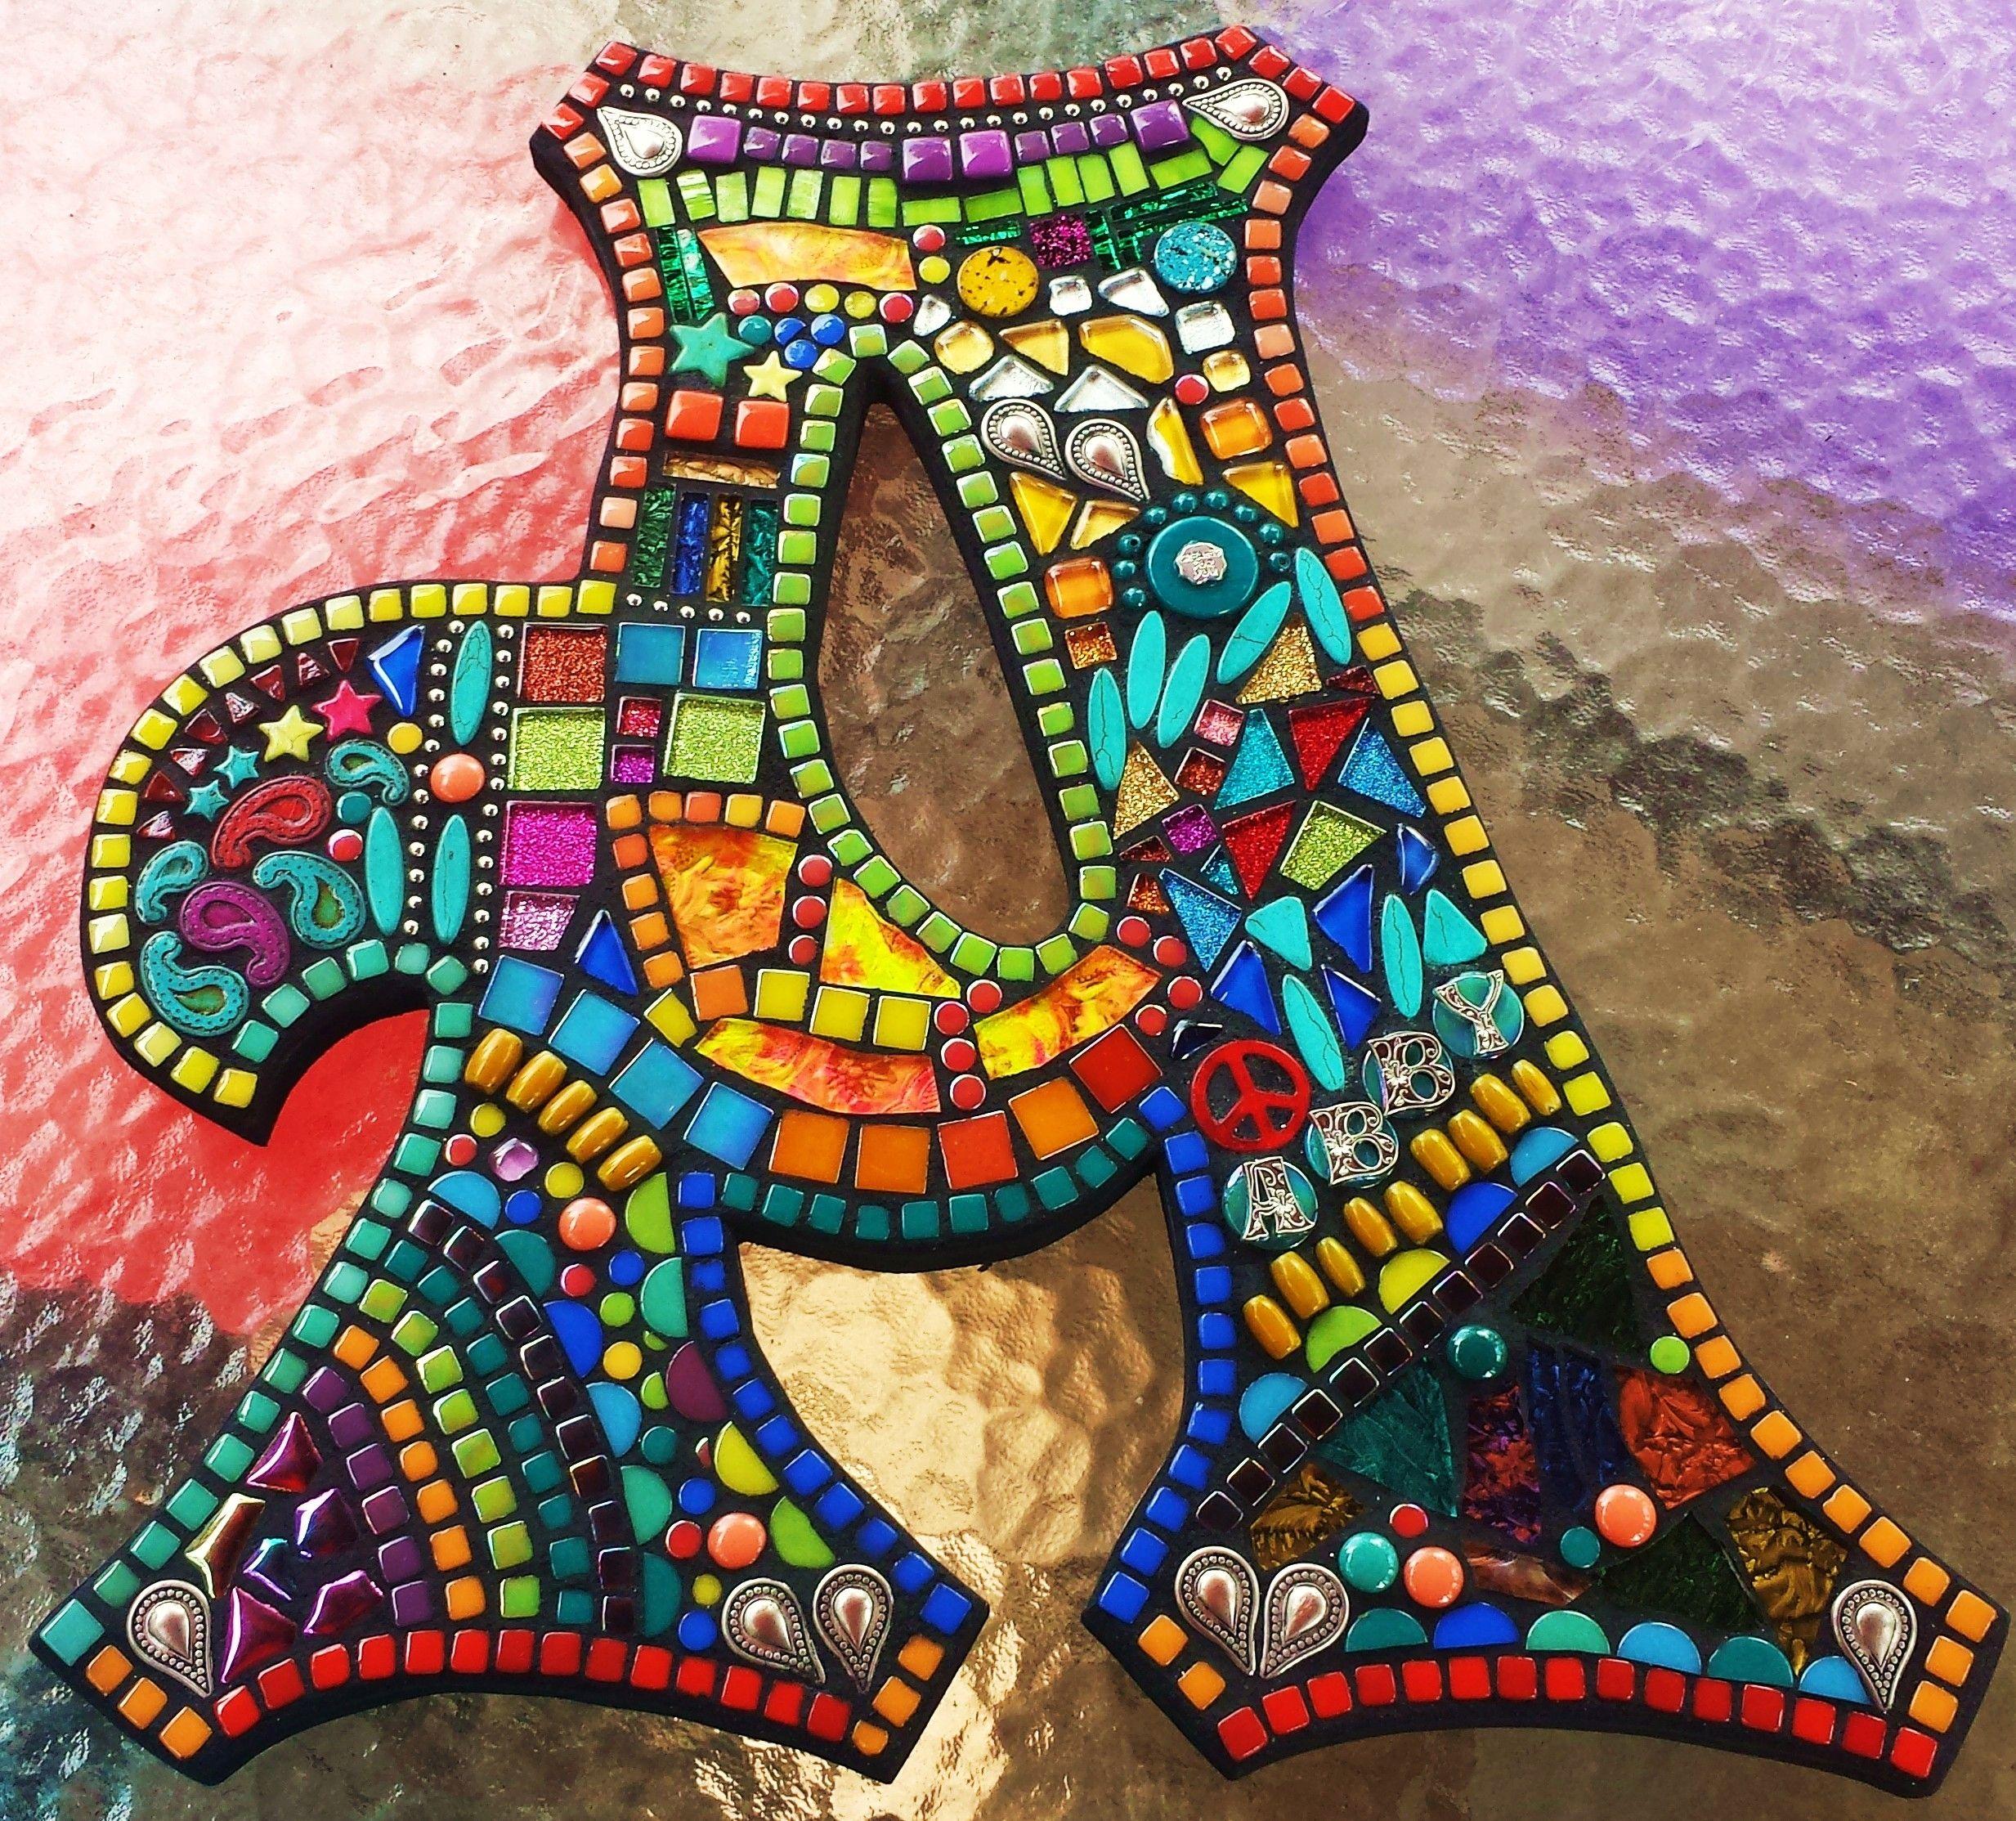 pin von wise crackin 39 mosaics auf community mosaic board by i c mosaics pinterest mosaik. Black Bedroom Furniture Sets. Home Design Ideas